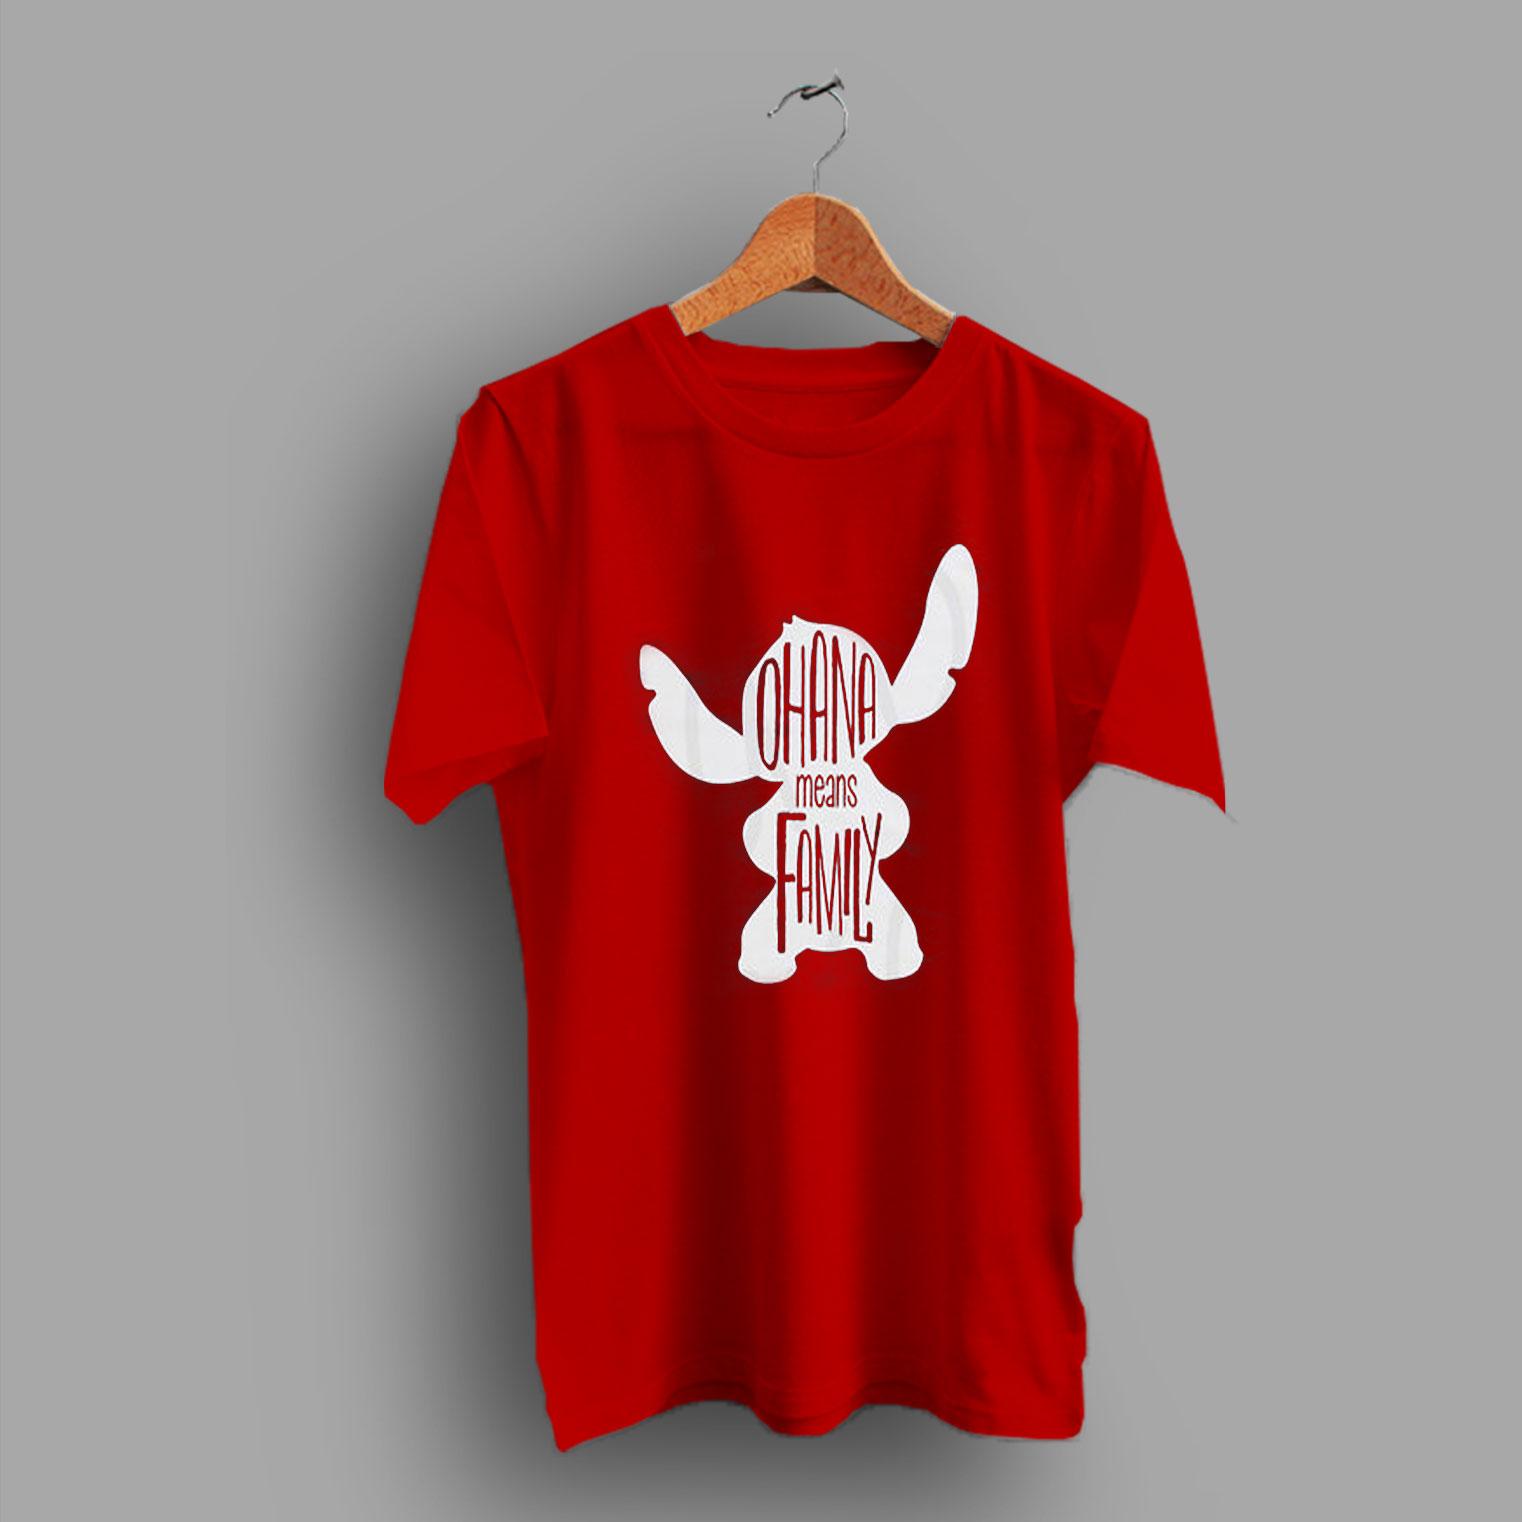 93bcef4d Vacation Matching Disney Trip Ohana Means Family T Shirt - HotVero